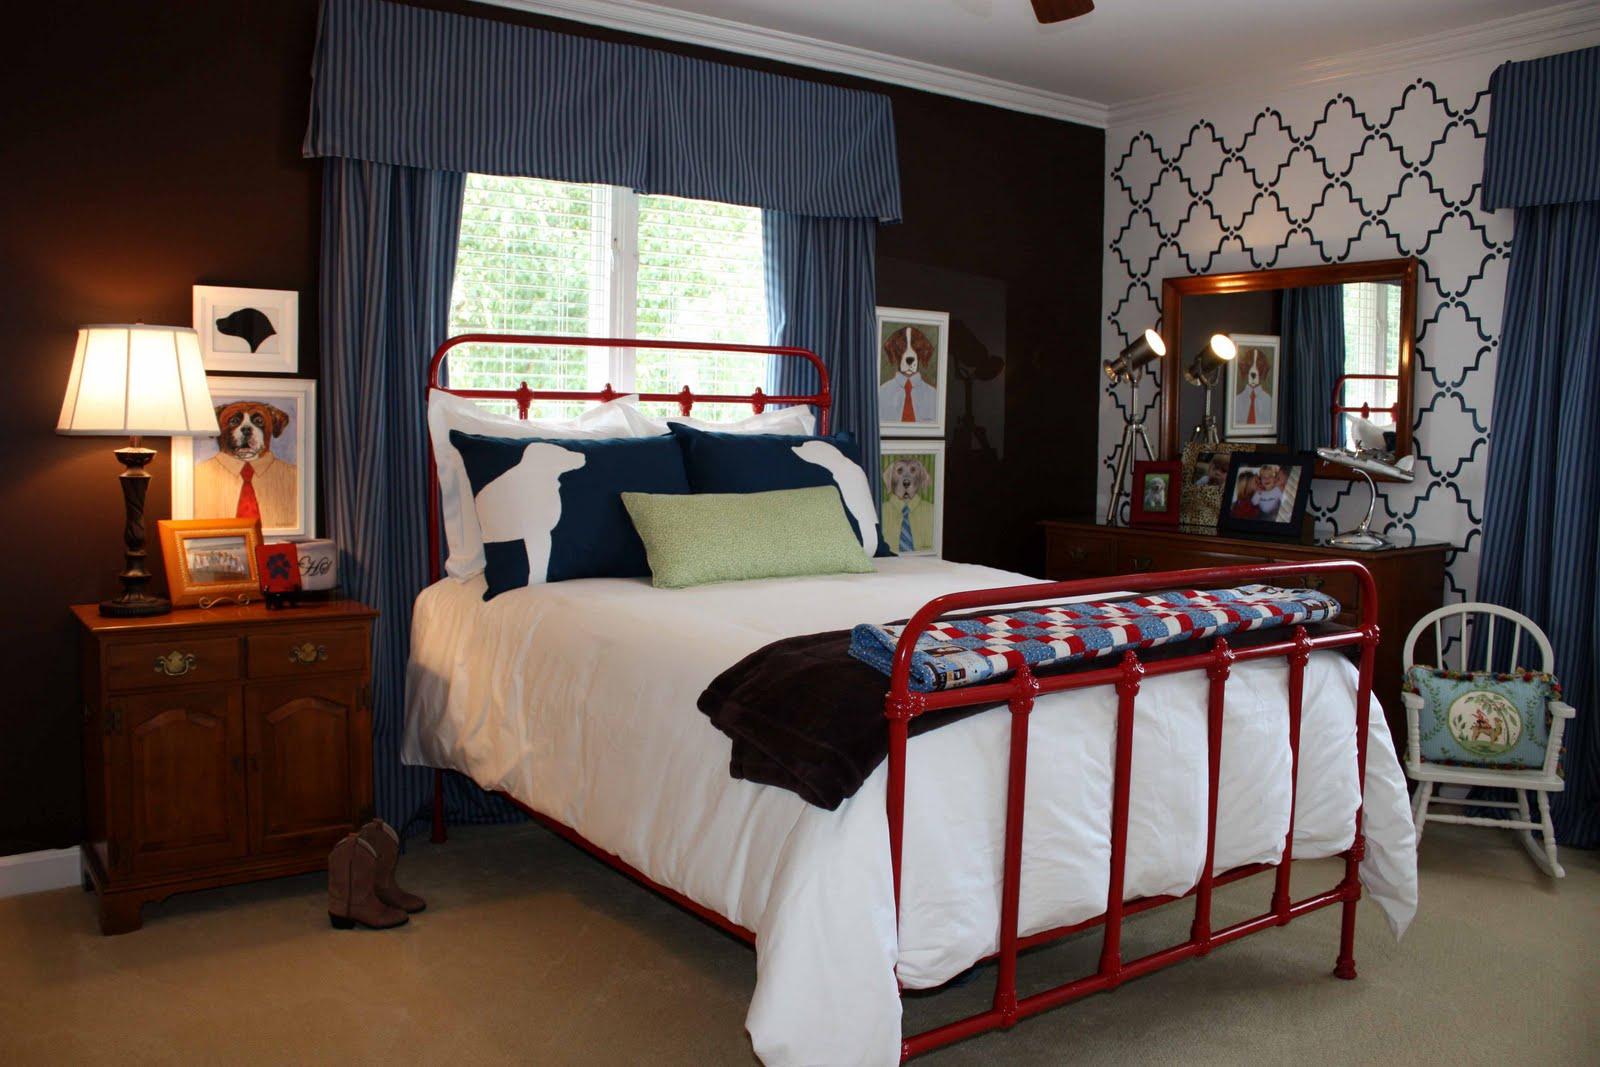 Youth Bedroom Furniture For Boys | Bedroom Furniture High ...